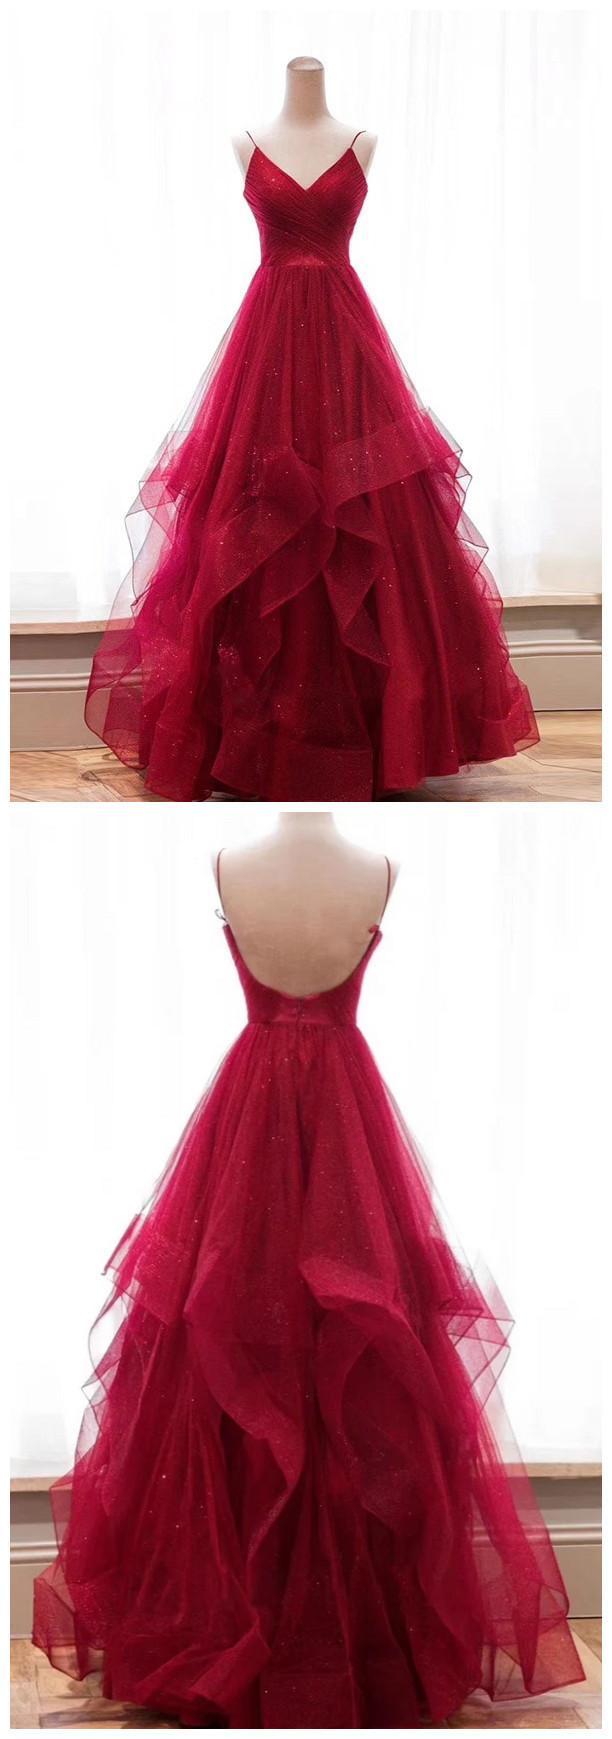 Prom Dress, Prom Dress, Prom Dress Long